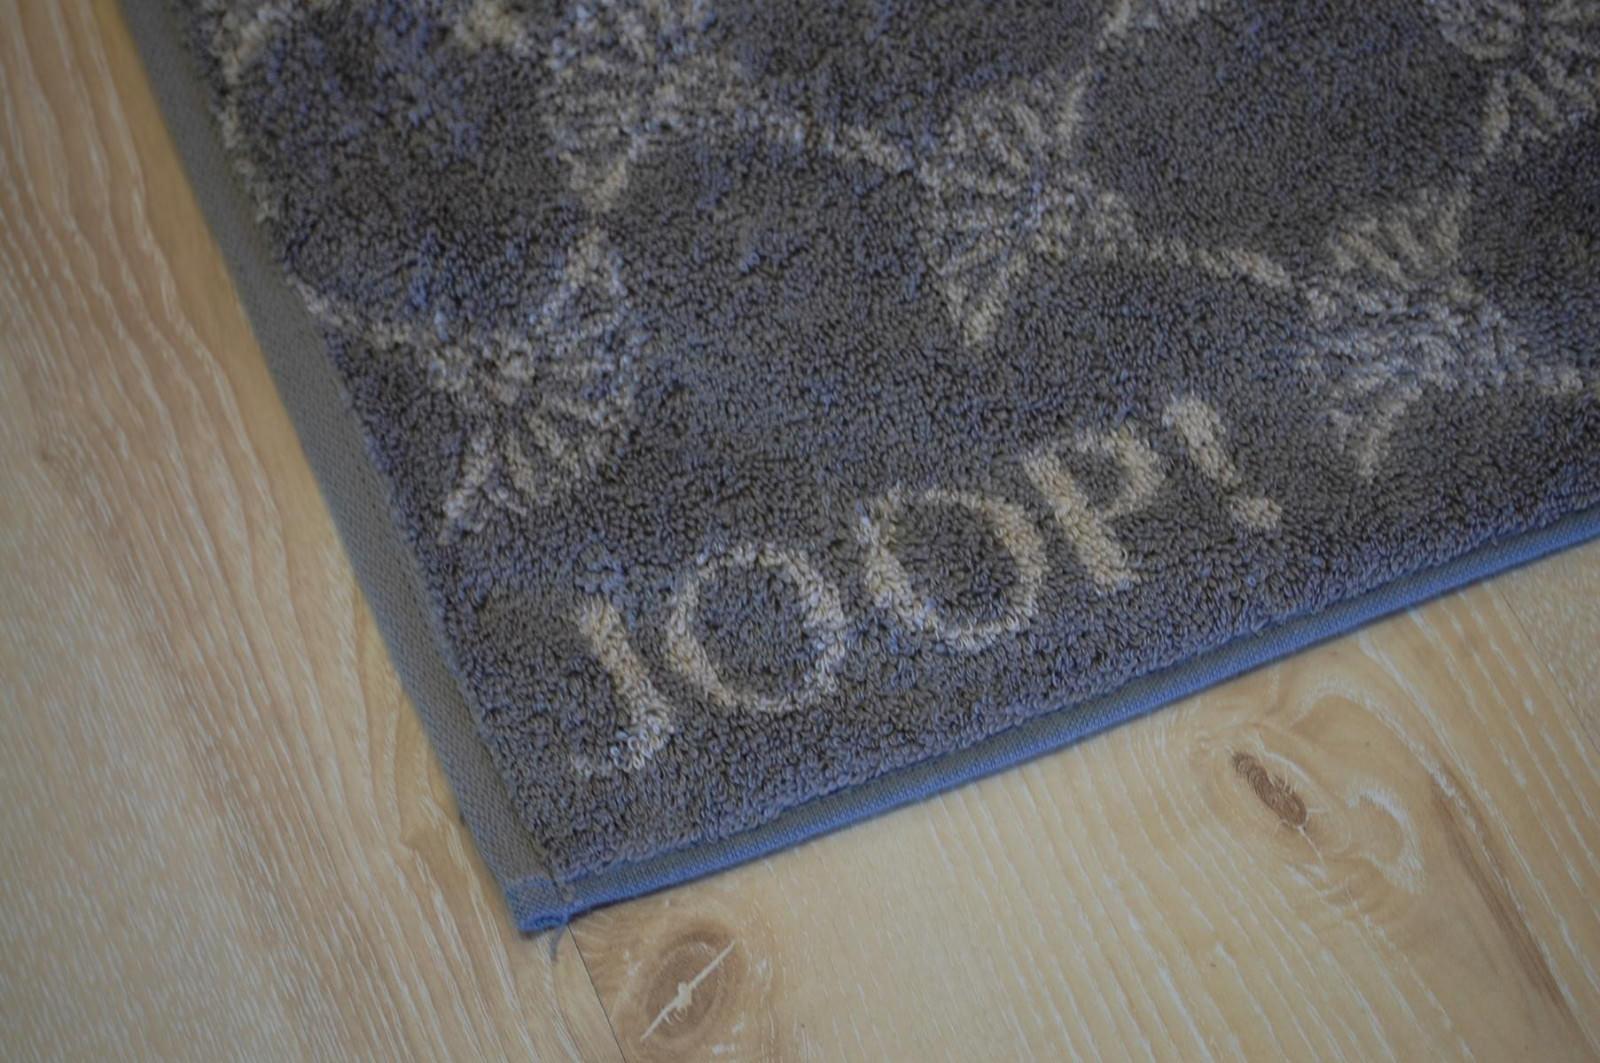 Joop  duschtuch balneazione Panno Signature 1657 Cornflower STRIPES 70 70 70 Grafite 80x150cm 2bdece